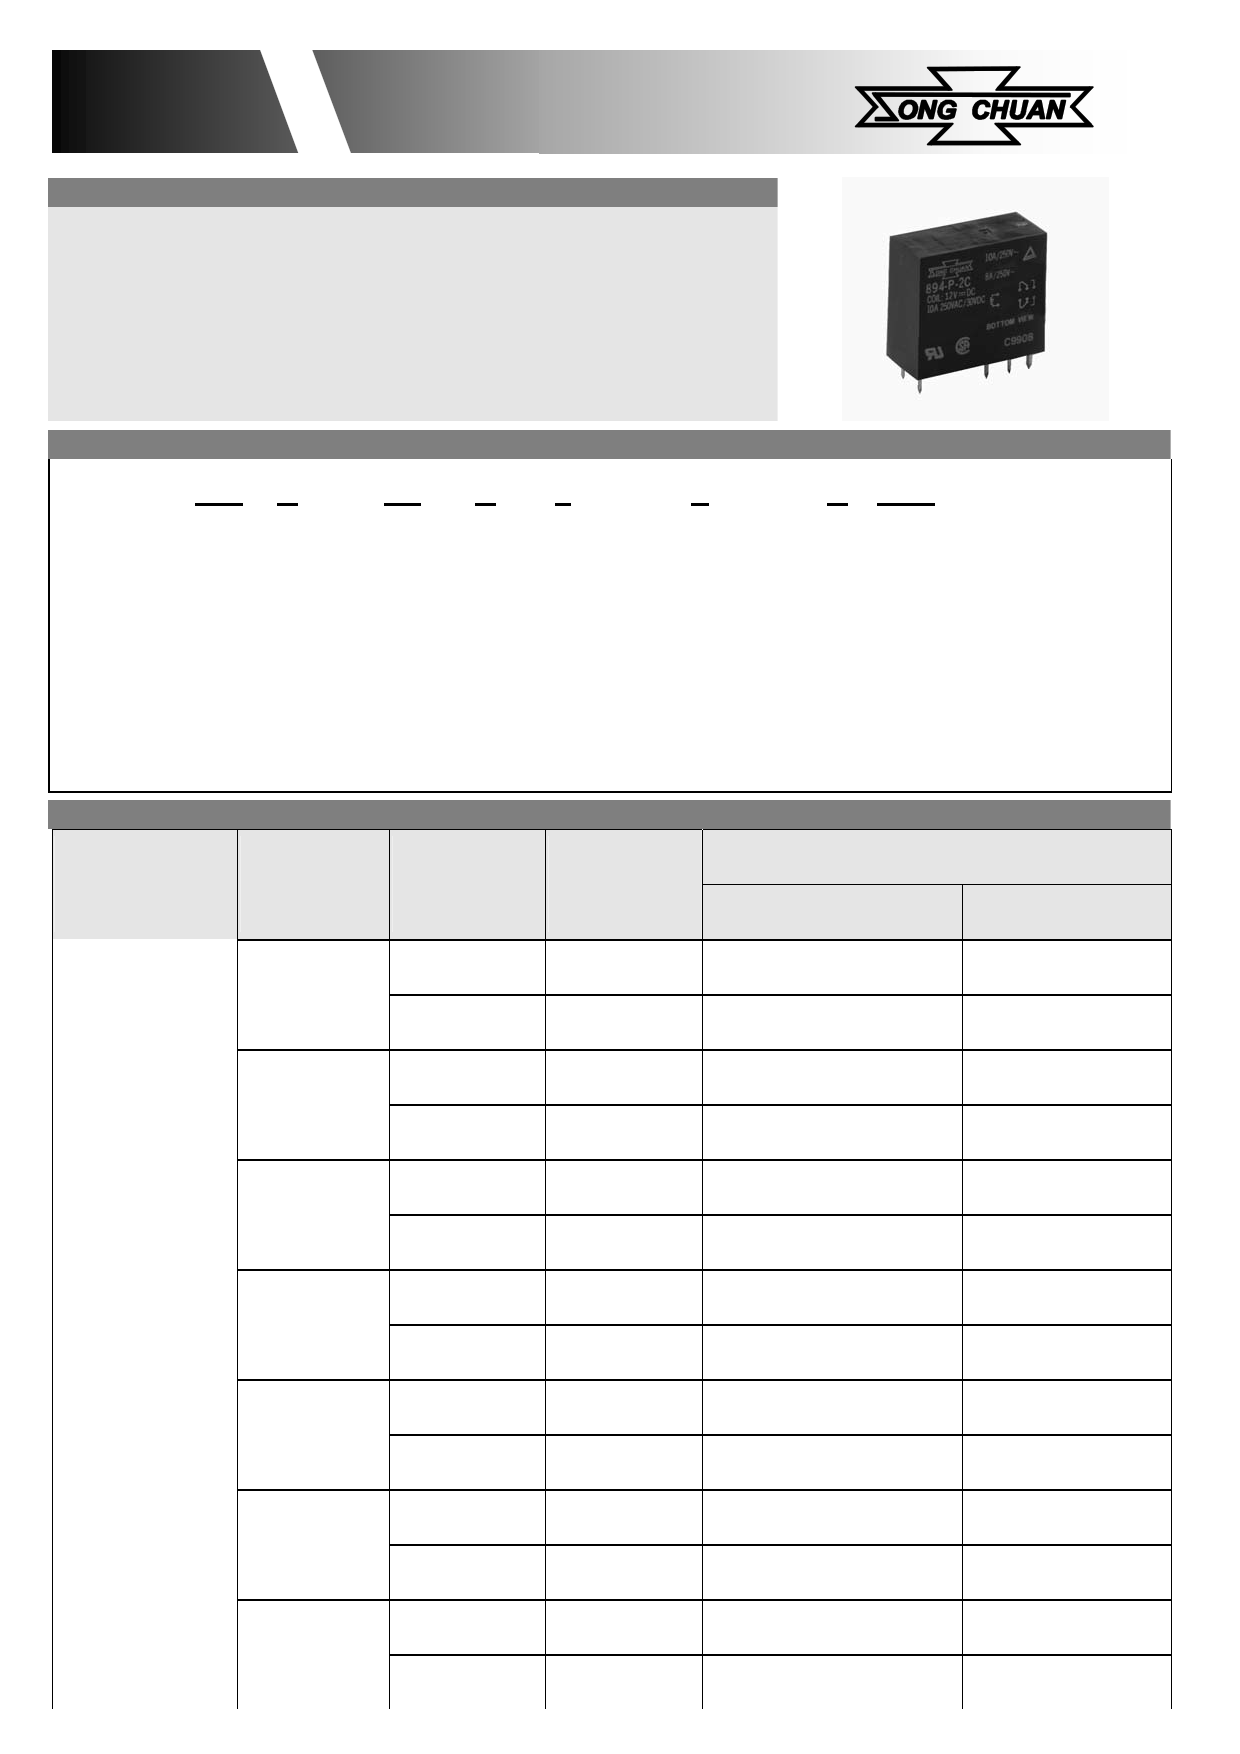 894-2AC1-F-S Datasheet, 894-2AC1-F-S PDF,ピン配置, 機能